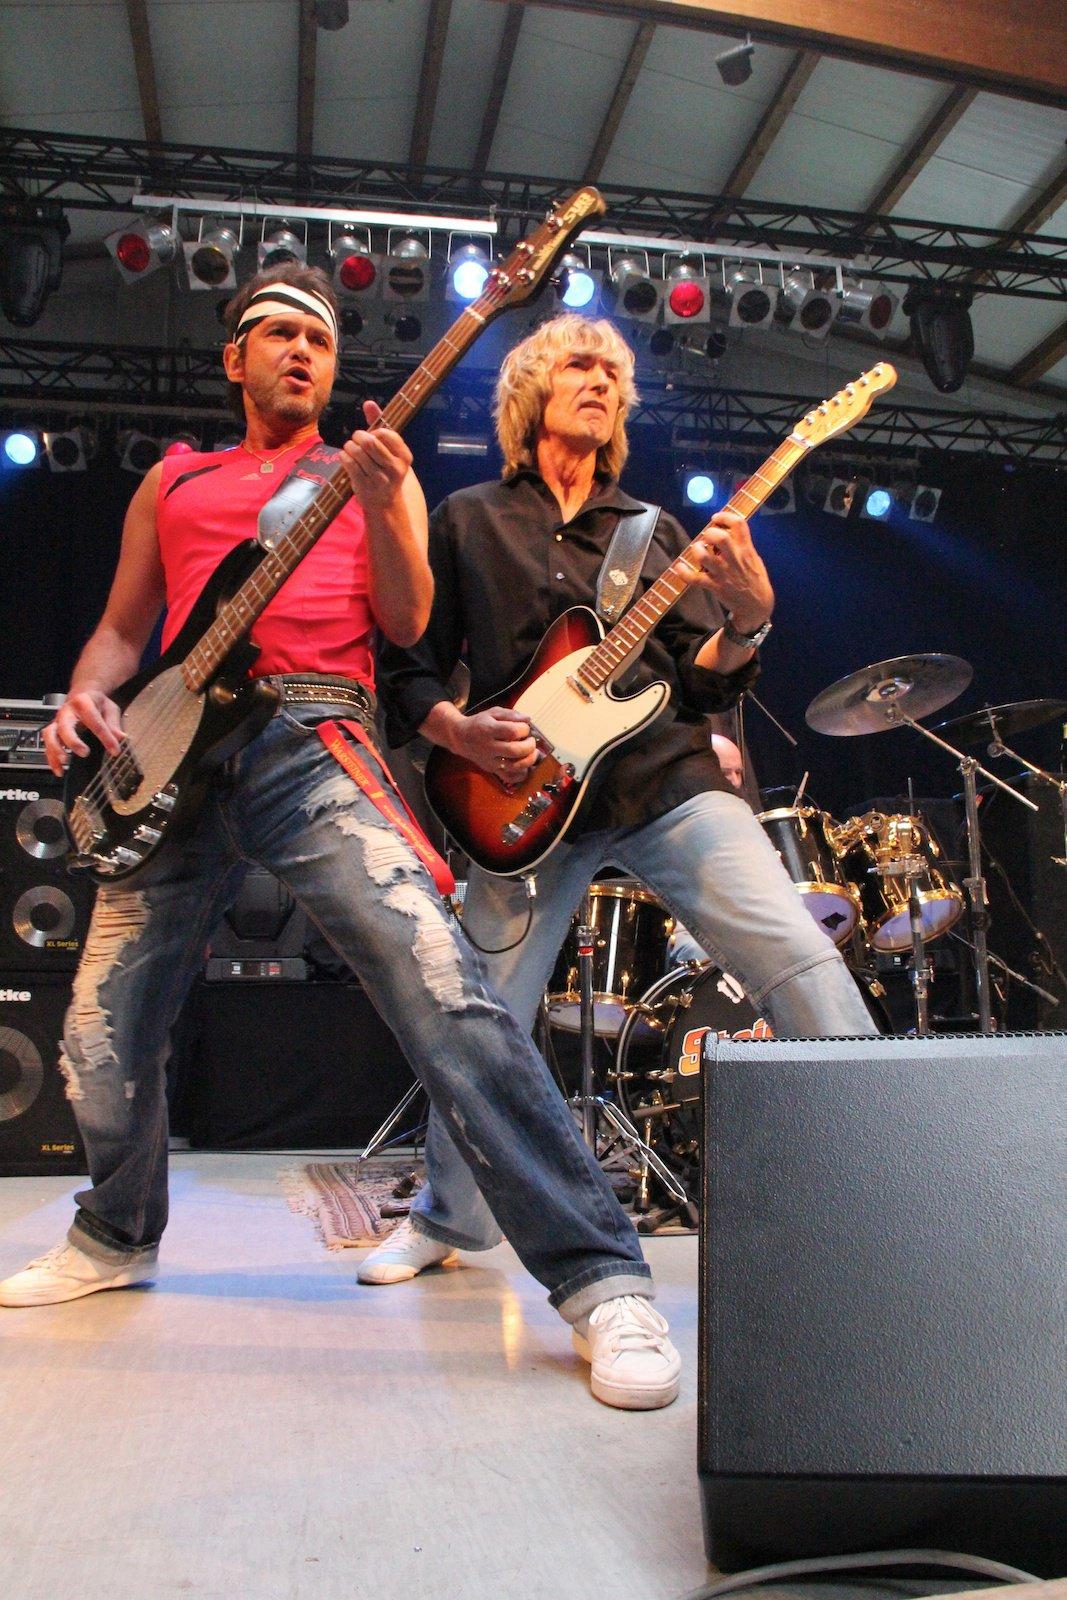 Stainless Quo - Sommerfesthalle, Otterstadt 18.06.2011 - 15